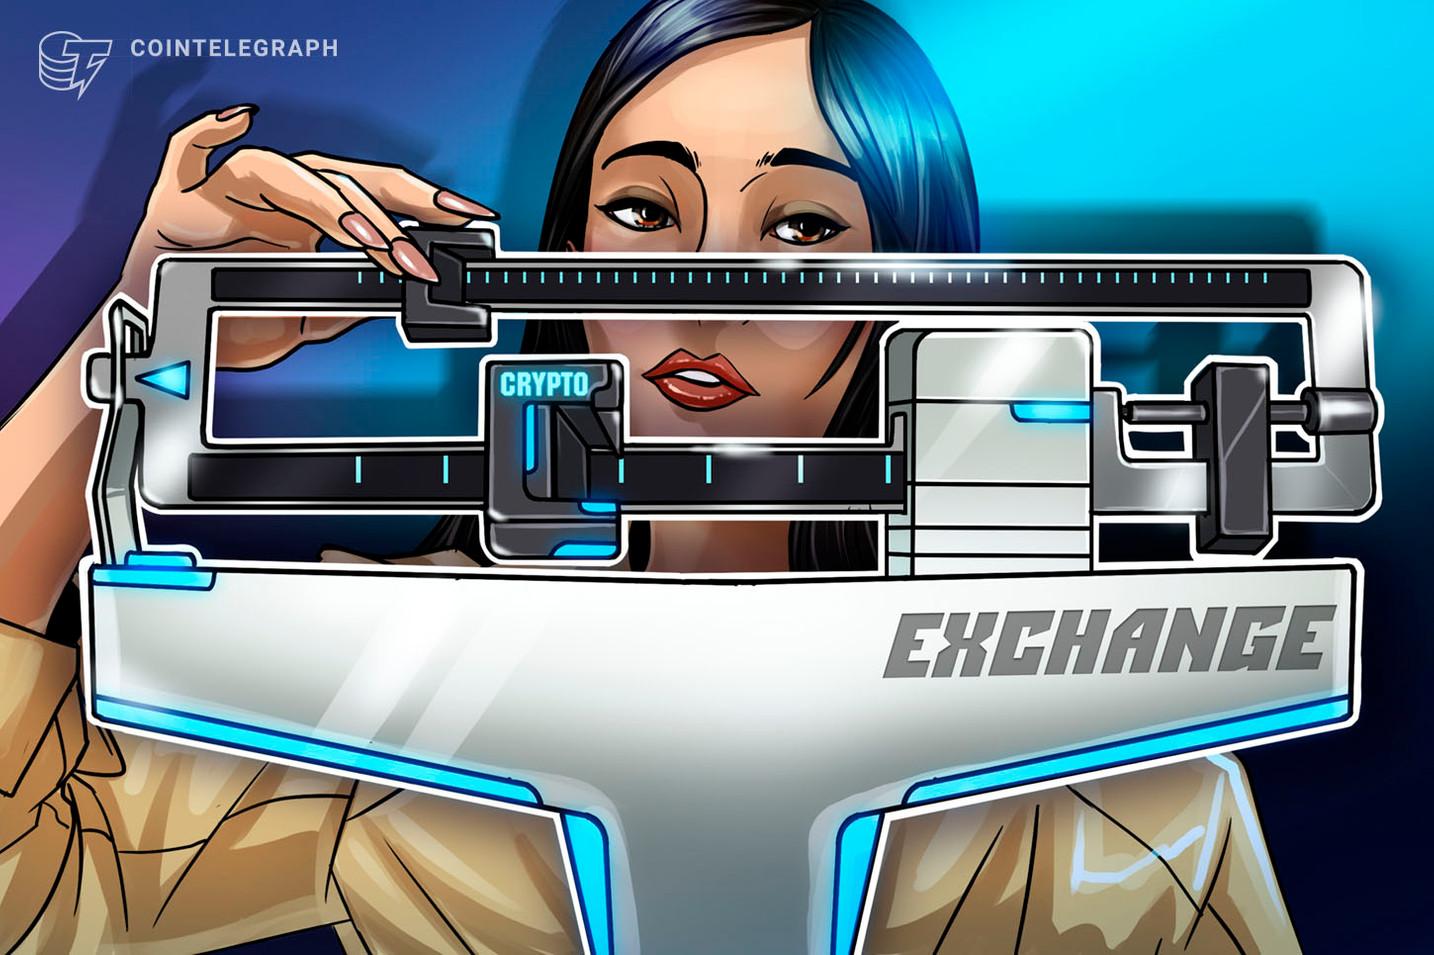 OKEx to Found Crypto Exchange Compliance Self-Regulated Organization